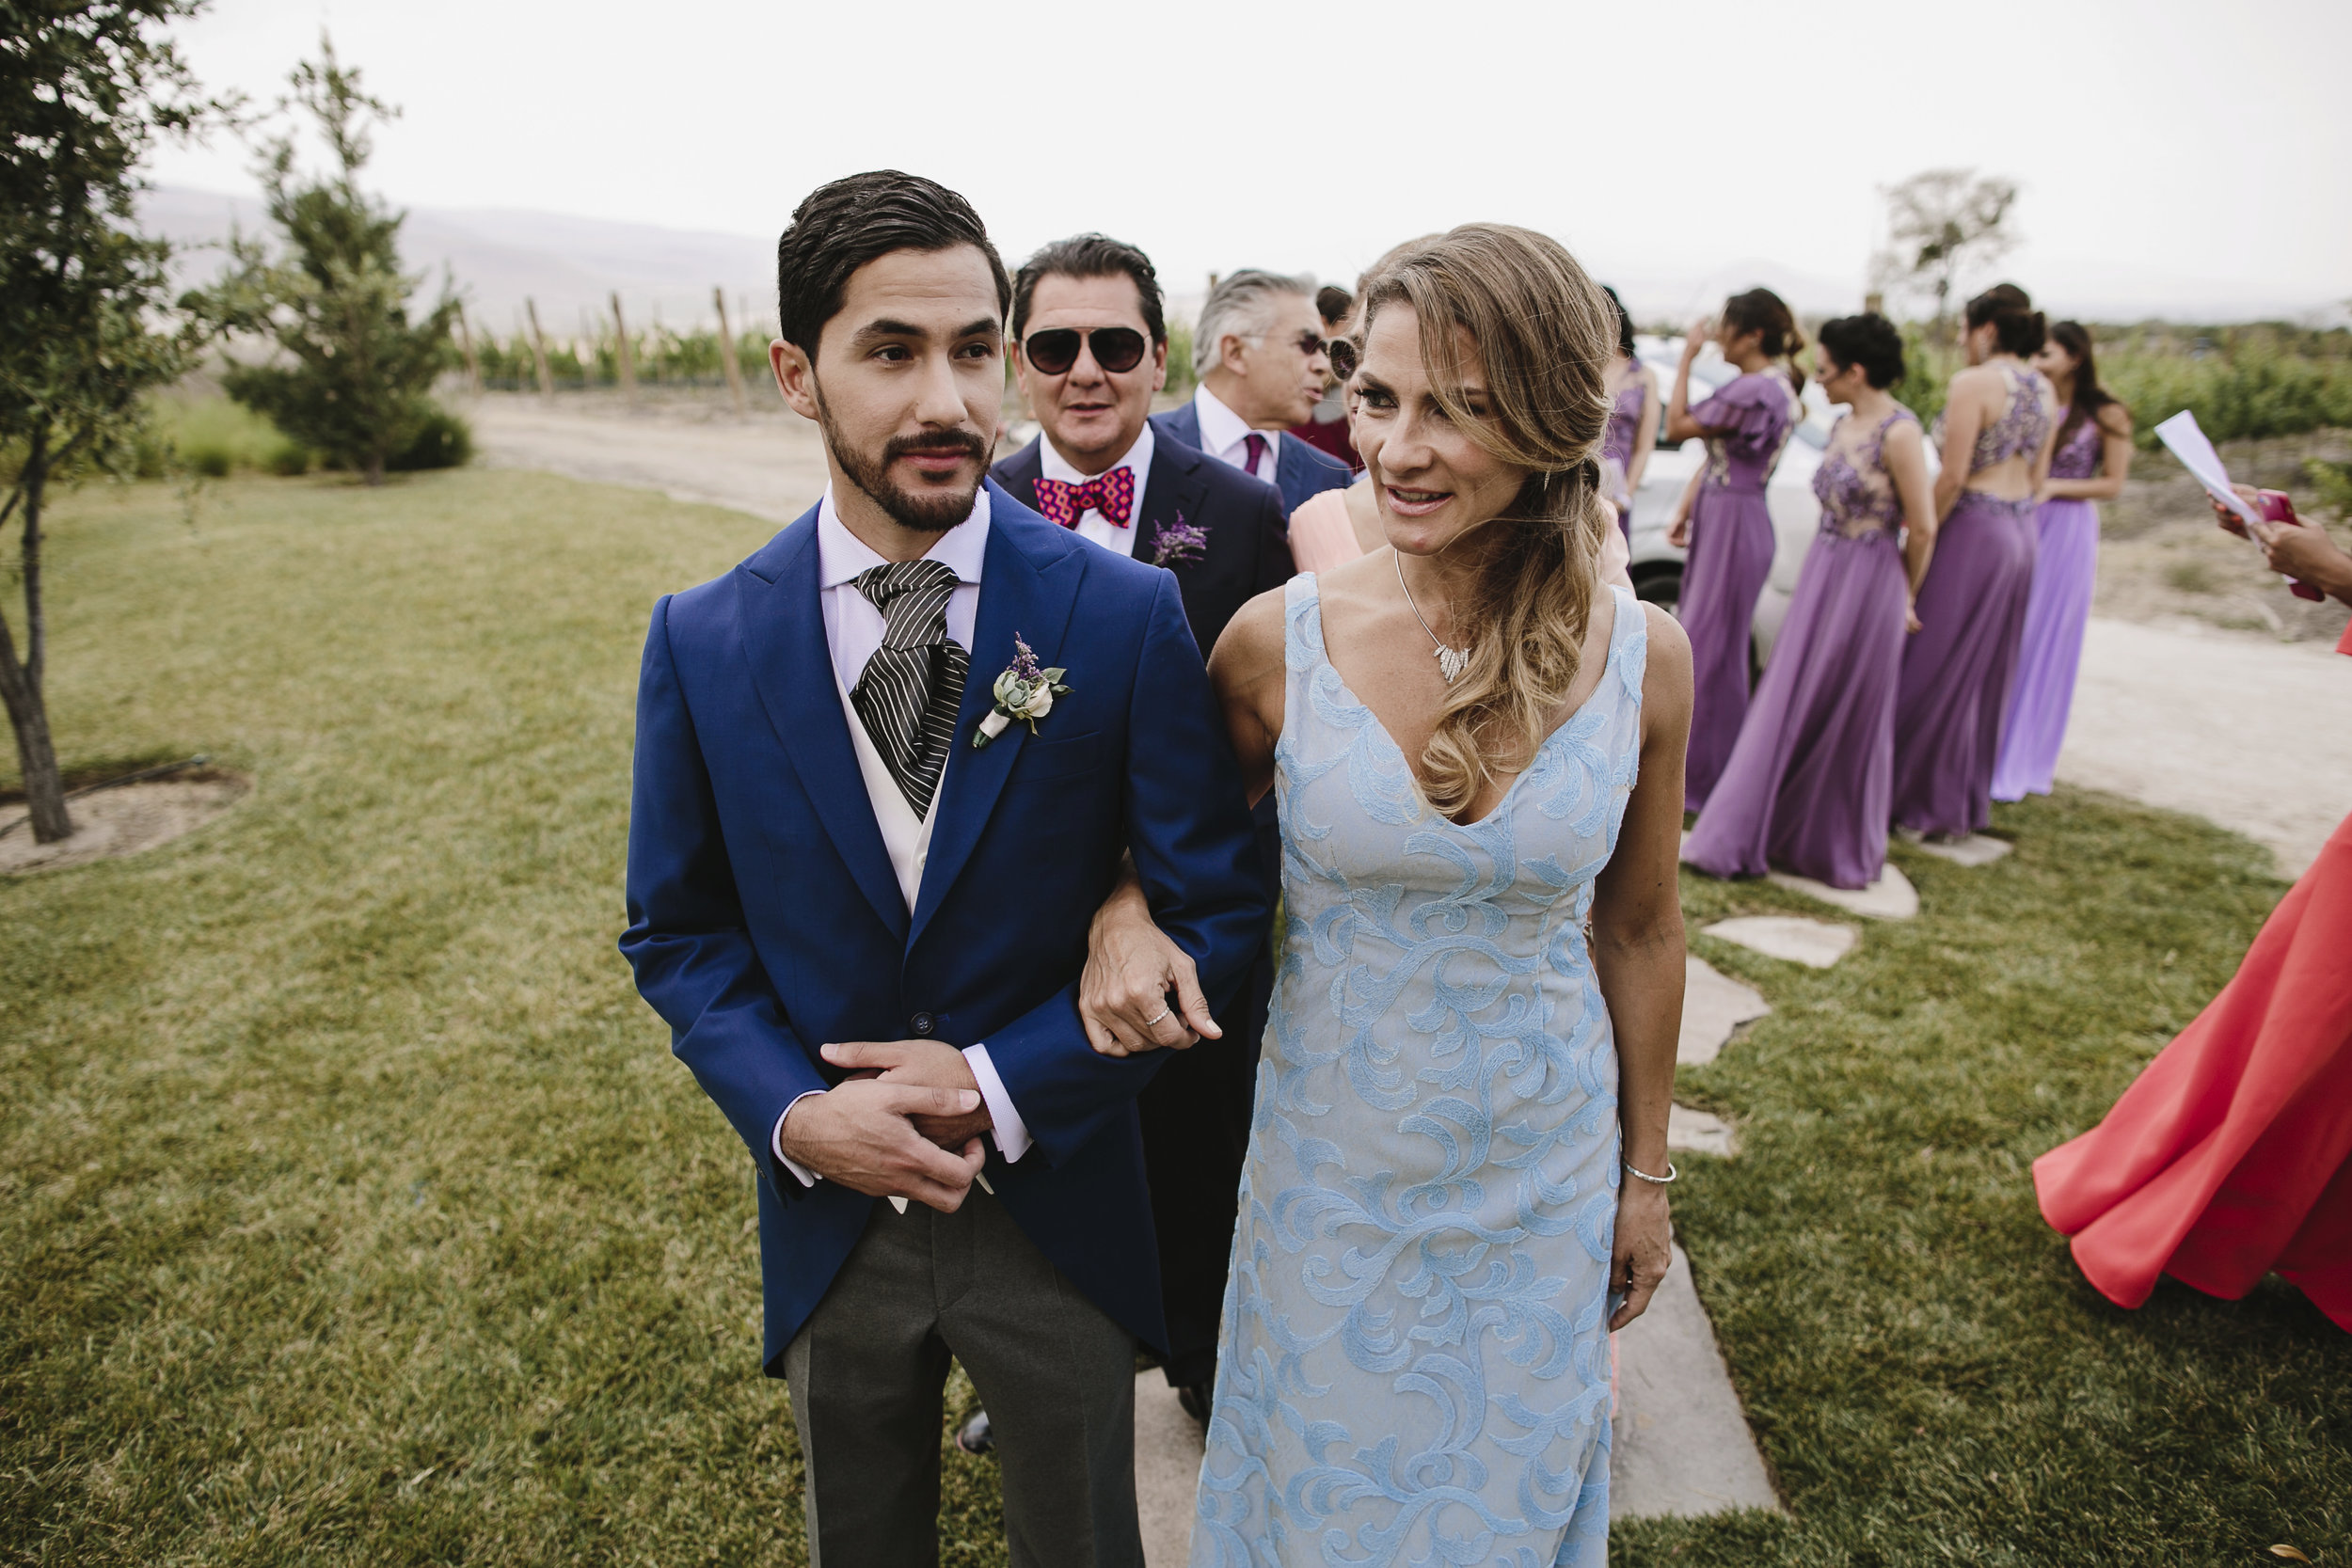 alfons_flores_destination_wedding_photography_mavi_david-828.JPG